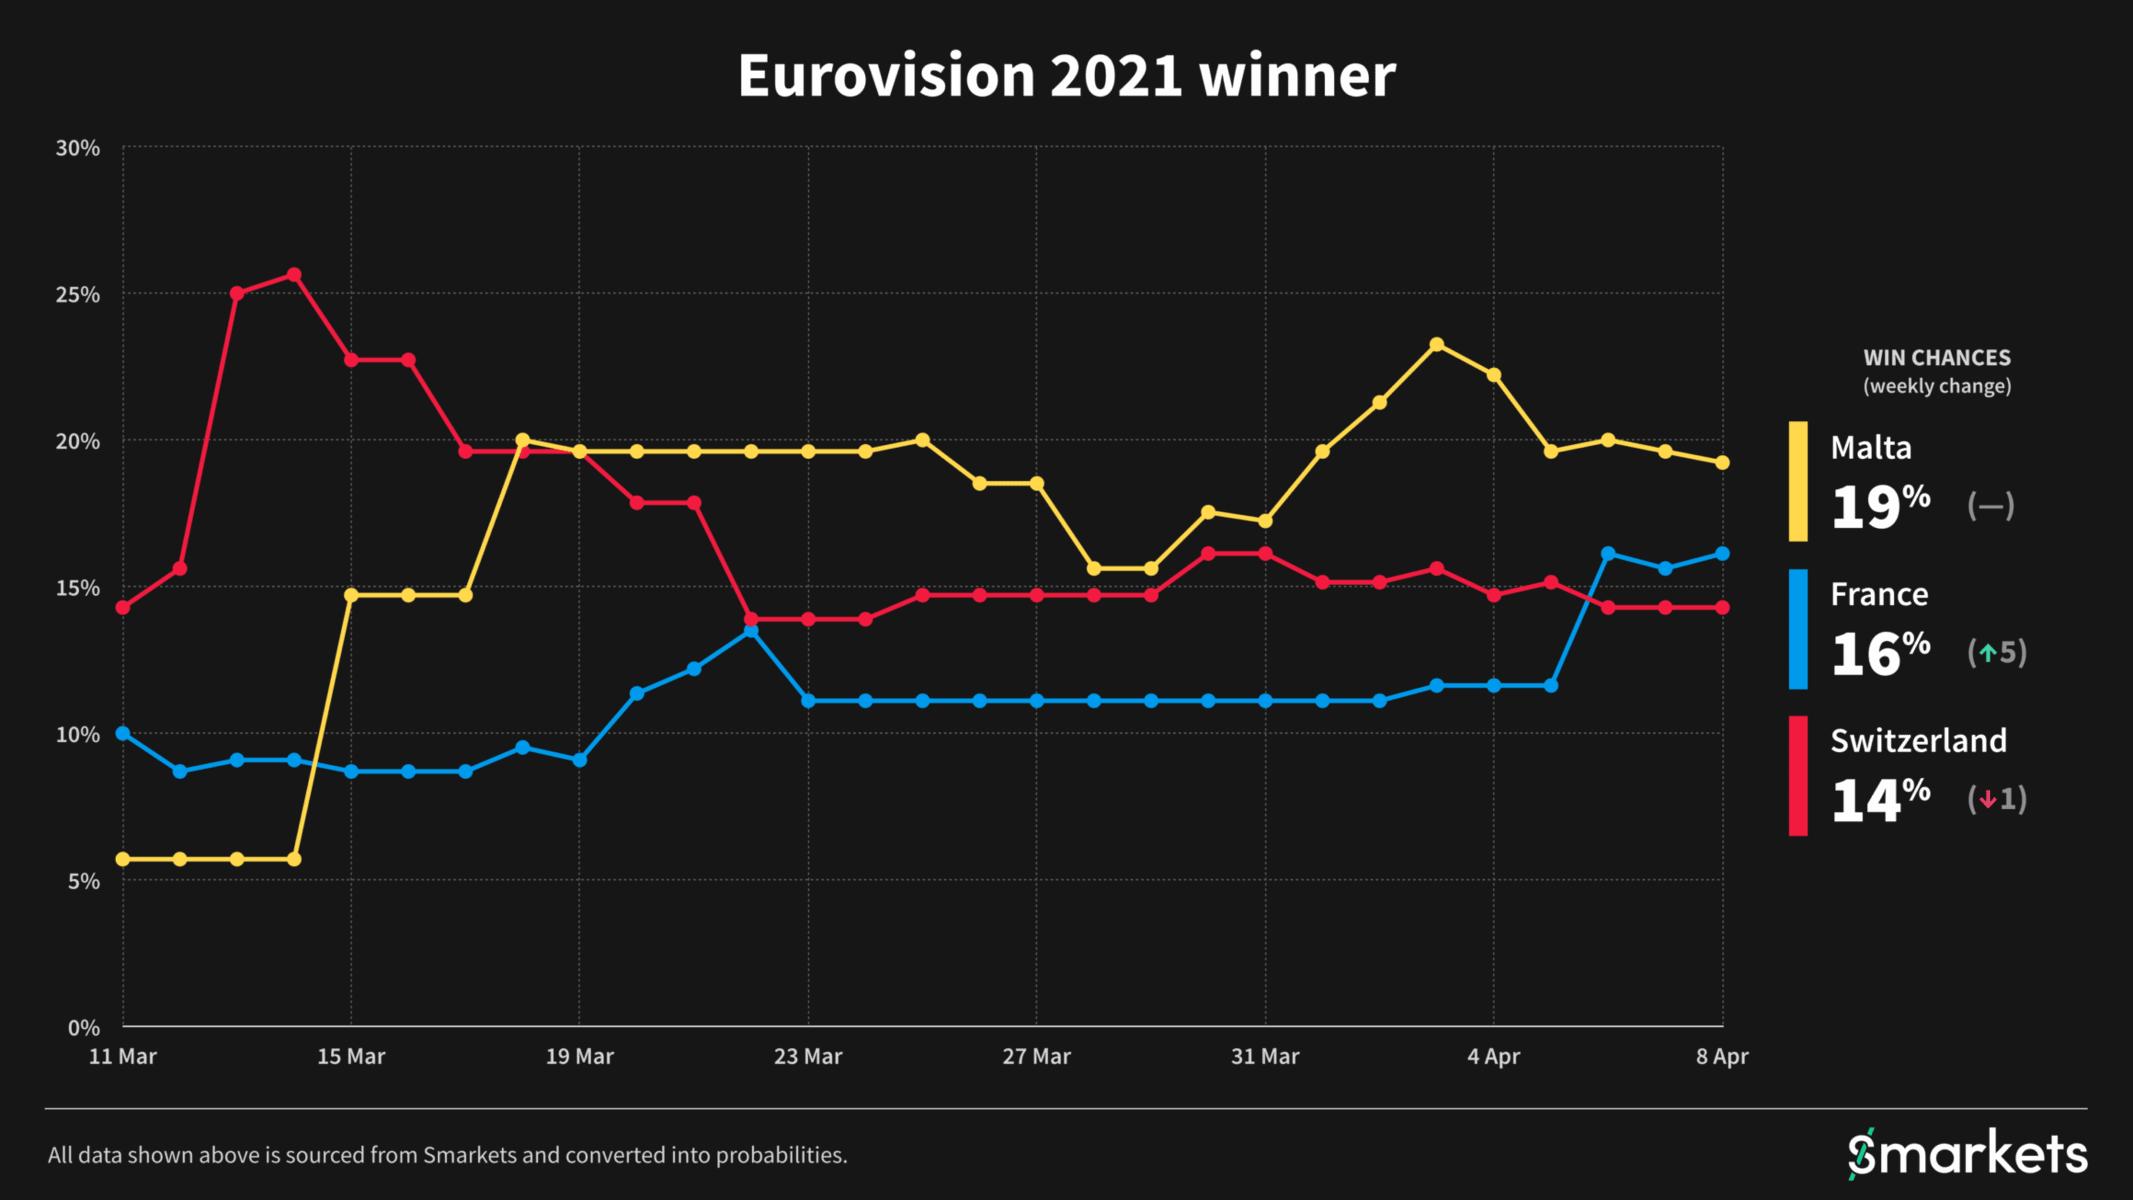 Eurovision 2021 winners revealed